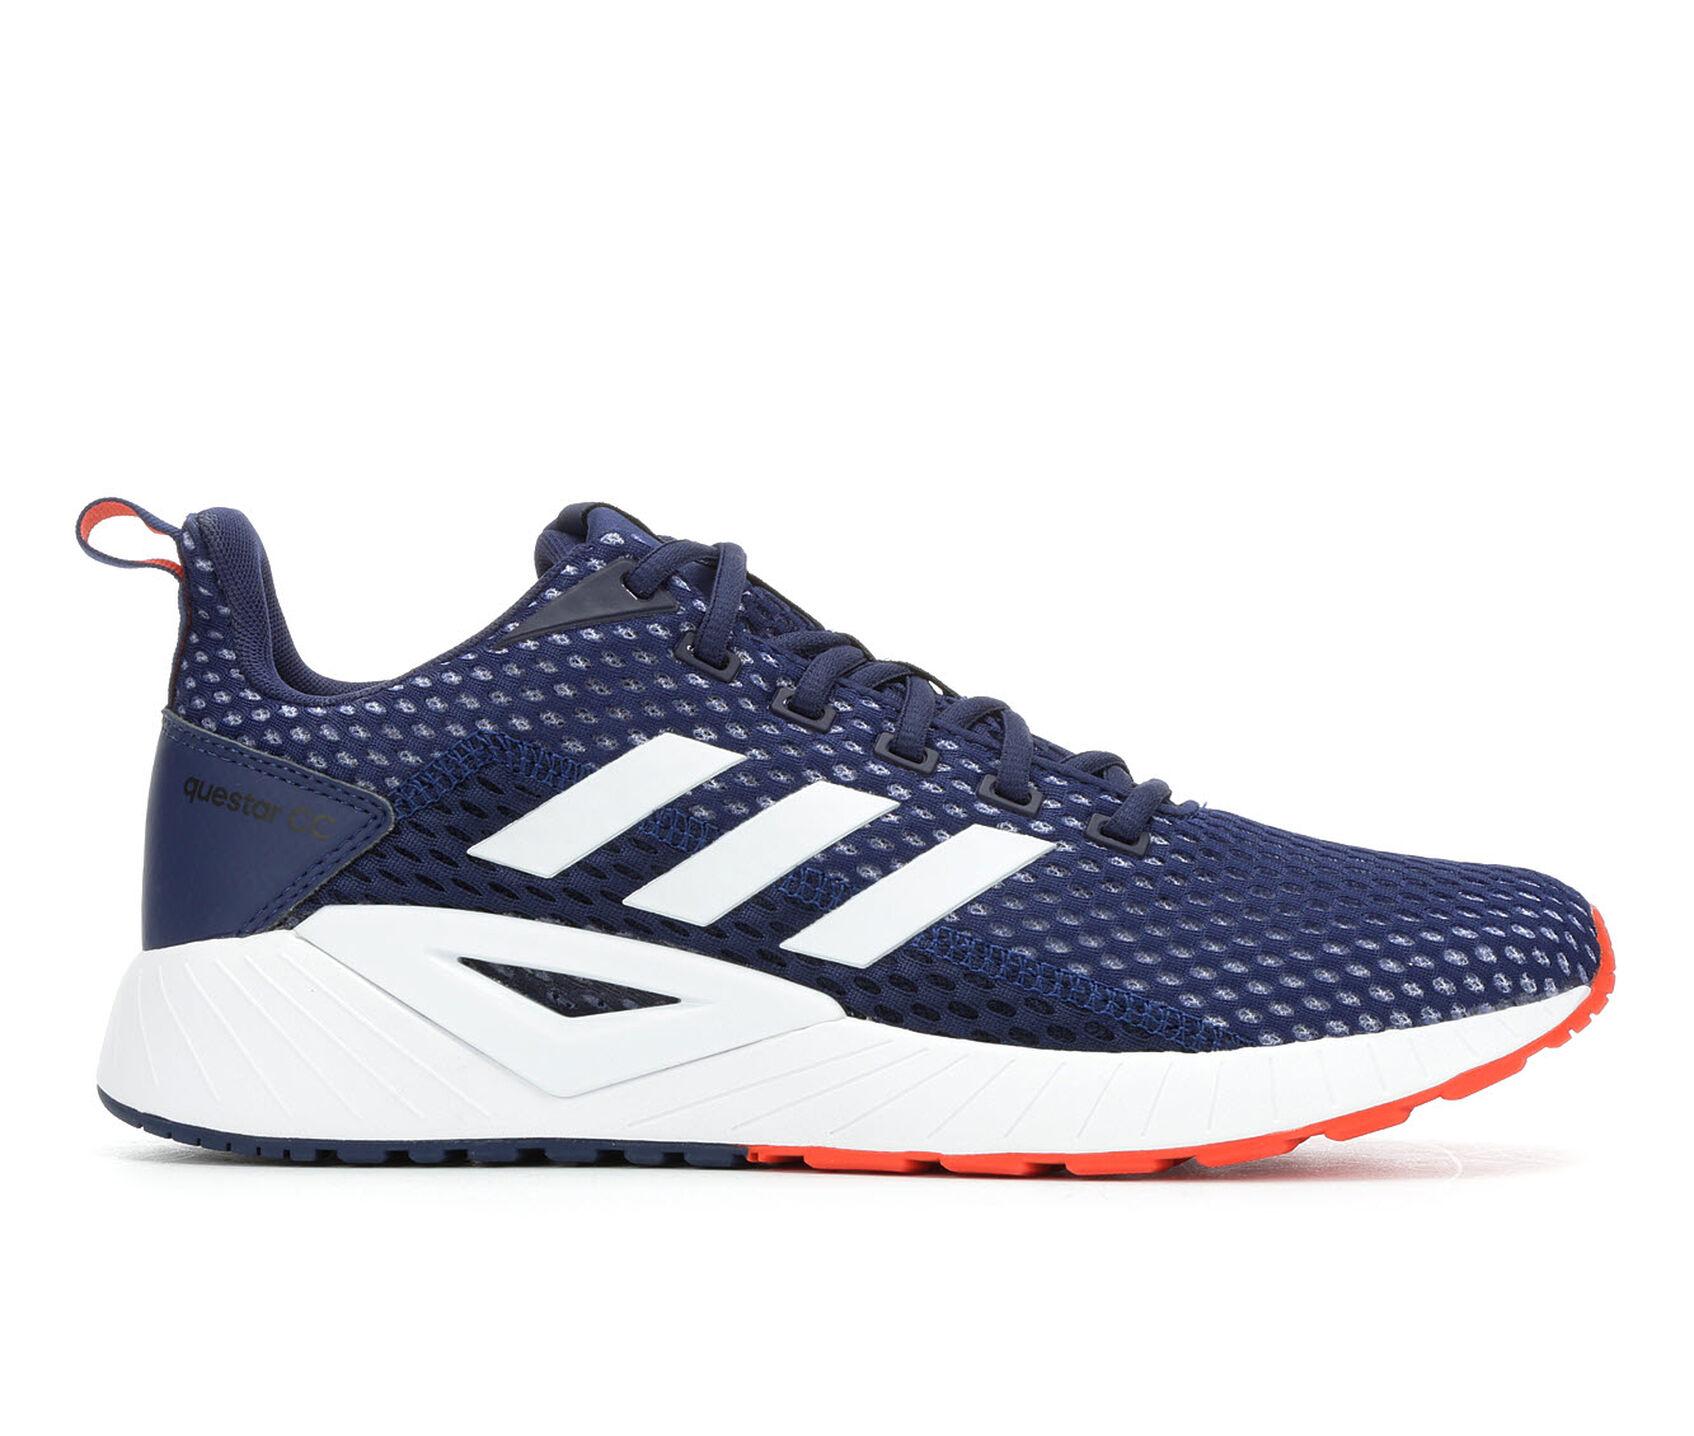 sports shoes f2c37 7b7d8 Men's Adidas Questar Climacool Running Shoes